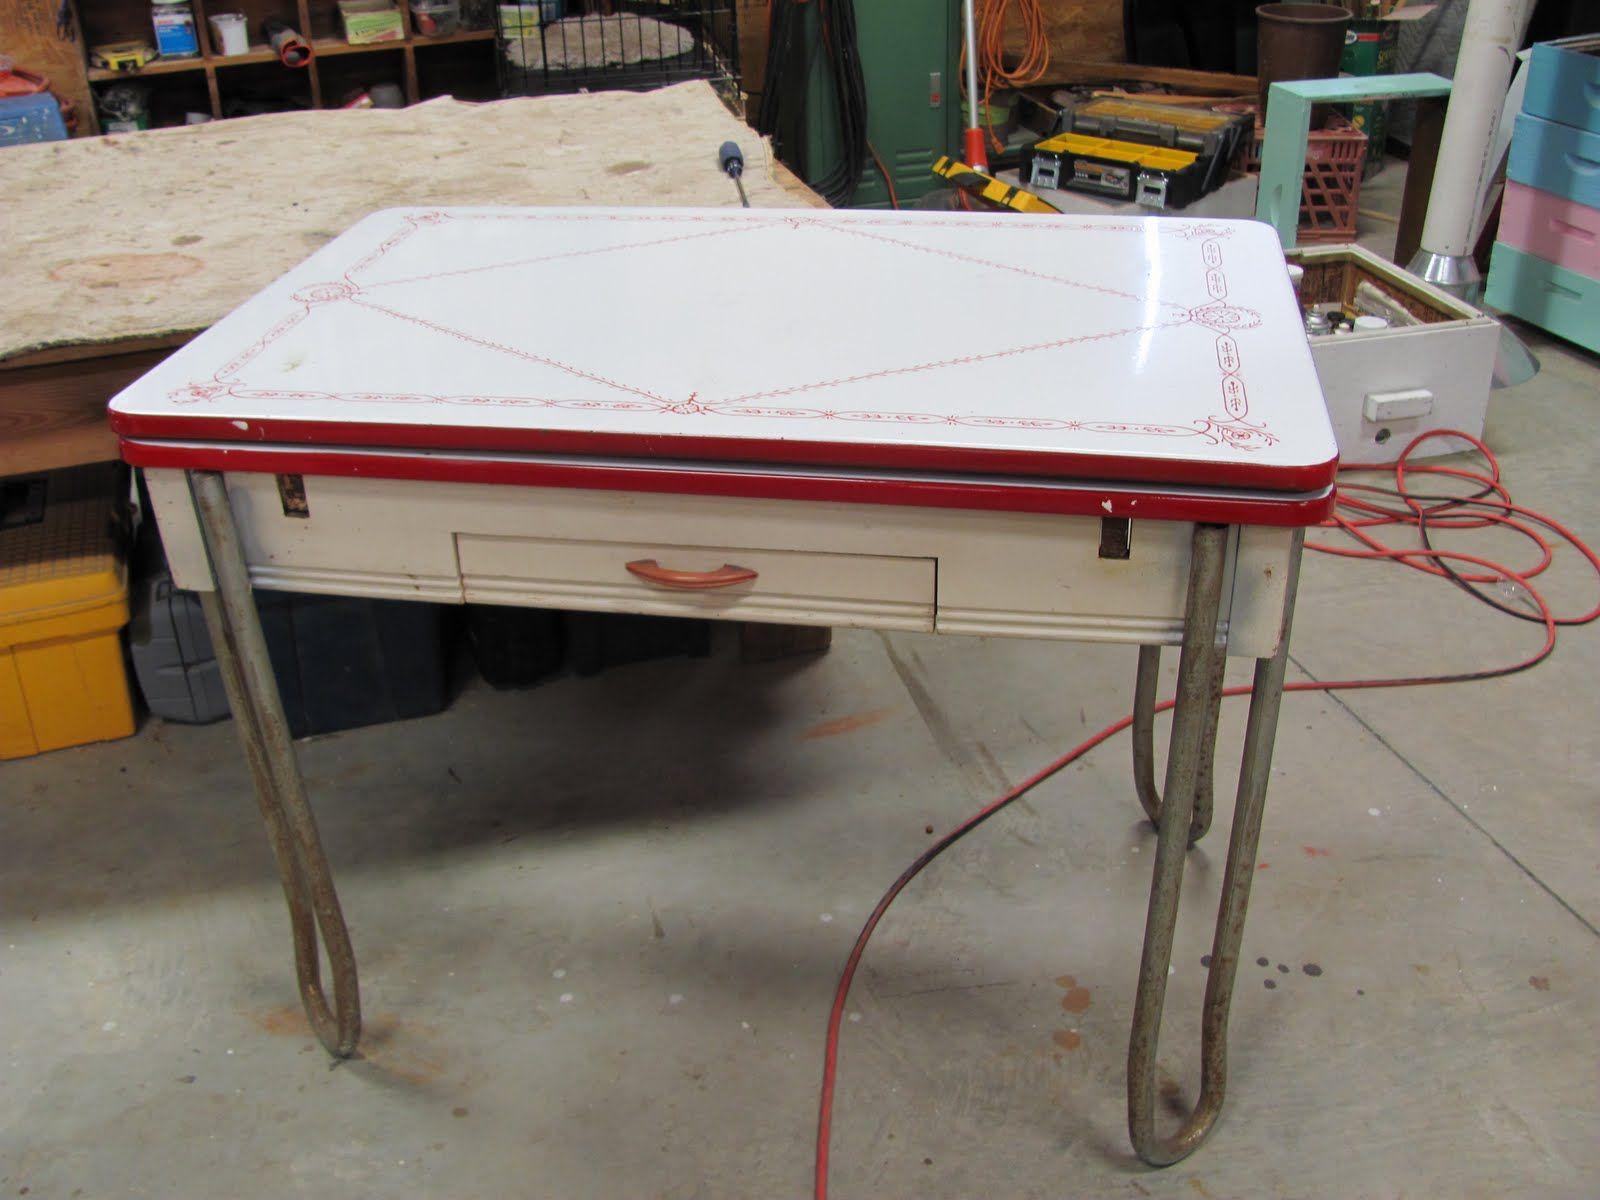 Vintage enamel top table   Vintage kitchen table, Kitchen table ...